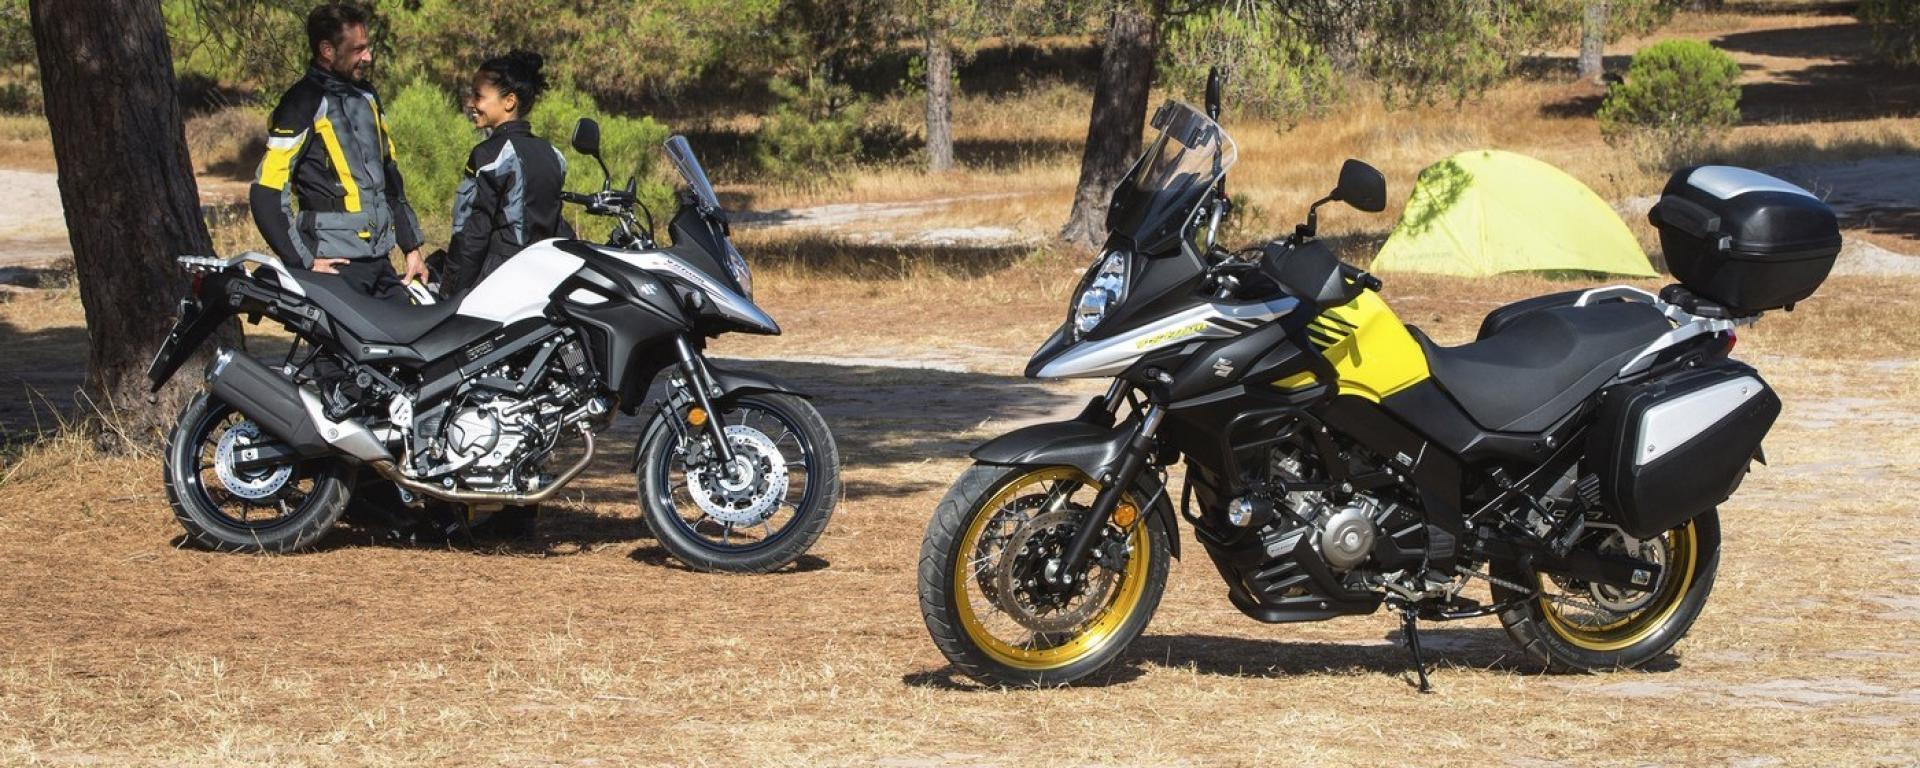 test-ride-vstrom-650